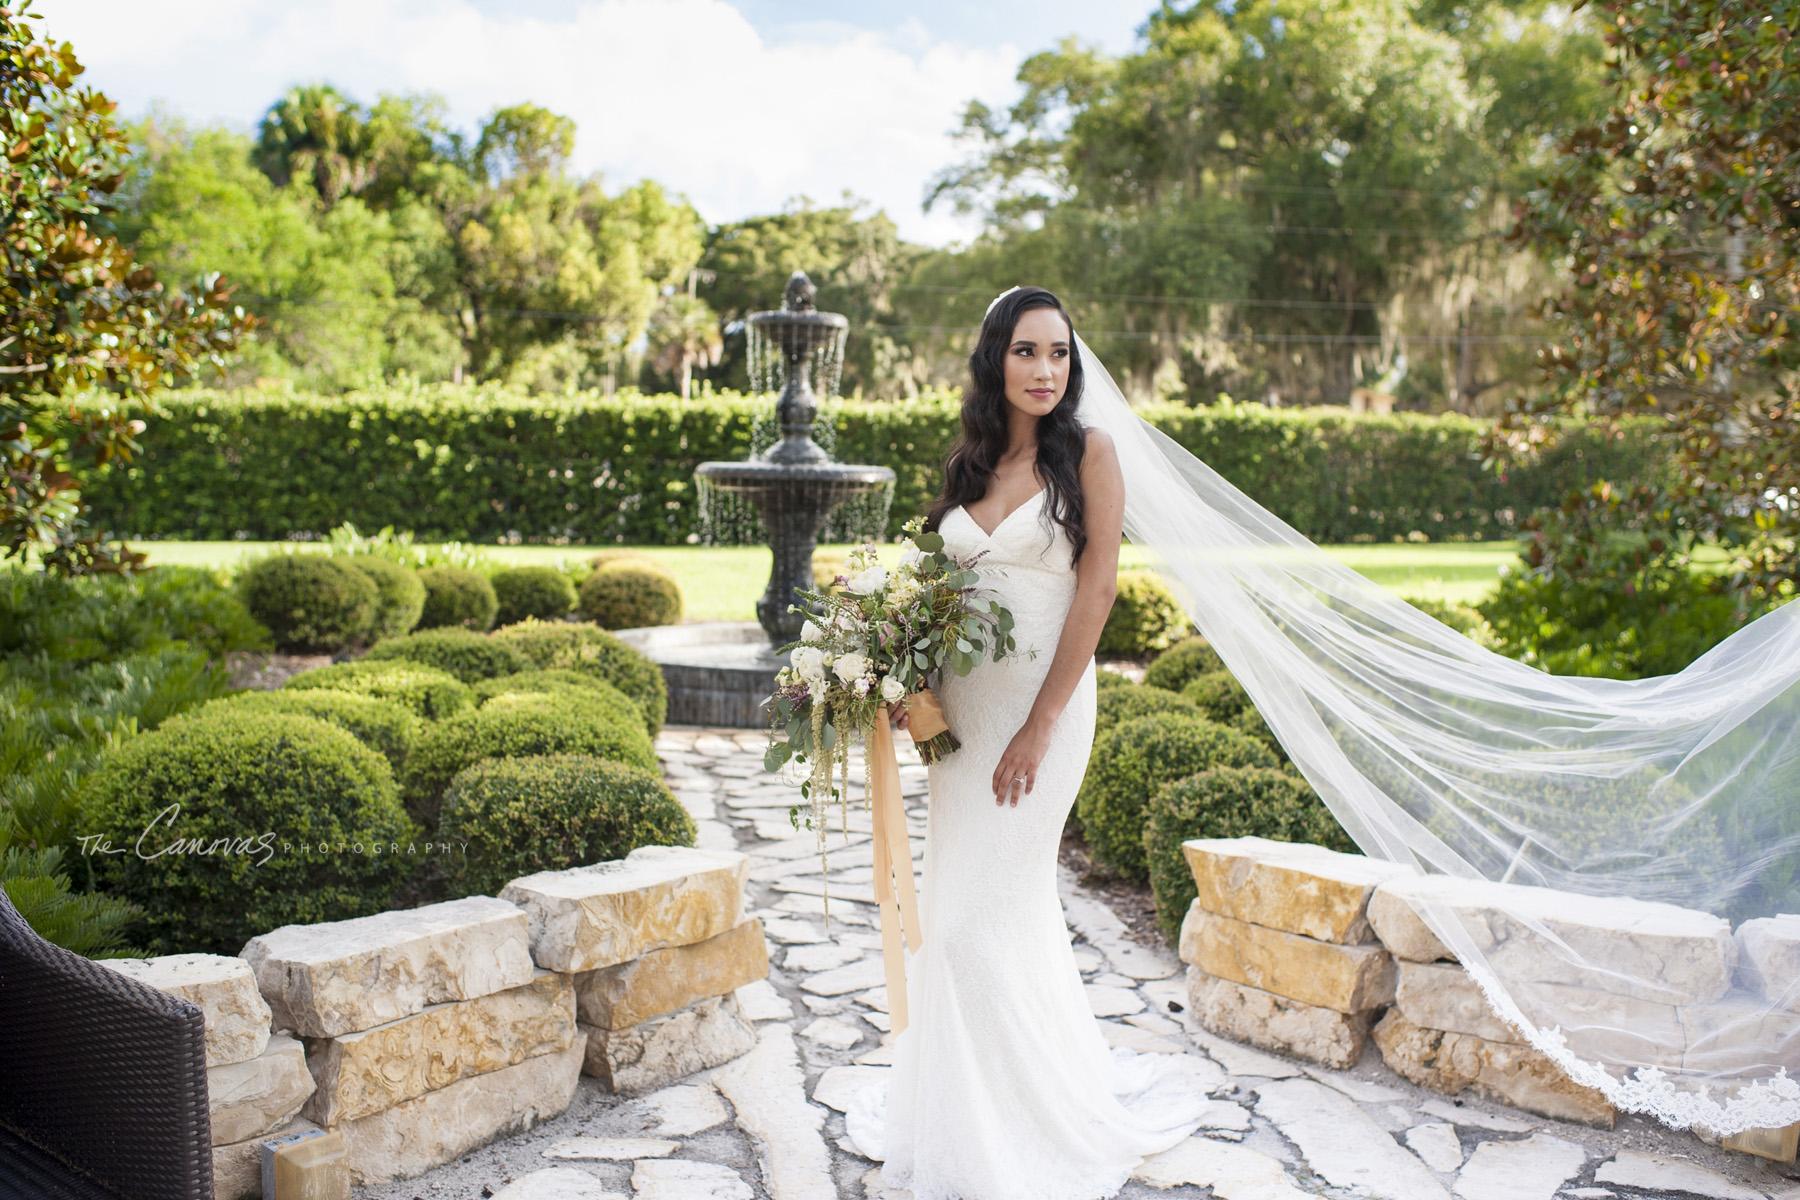 323_Stetson_DeLand_wedding_The_Canovas_Photography.jpg